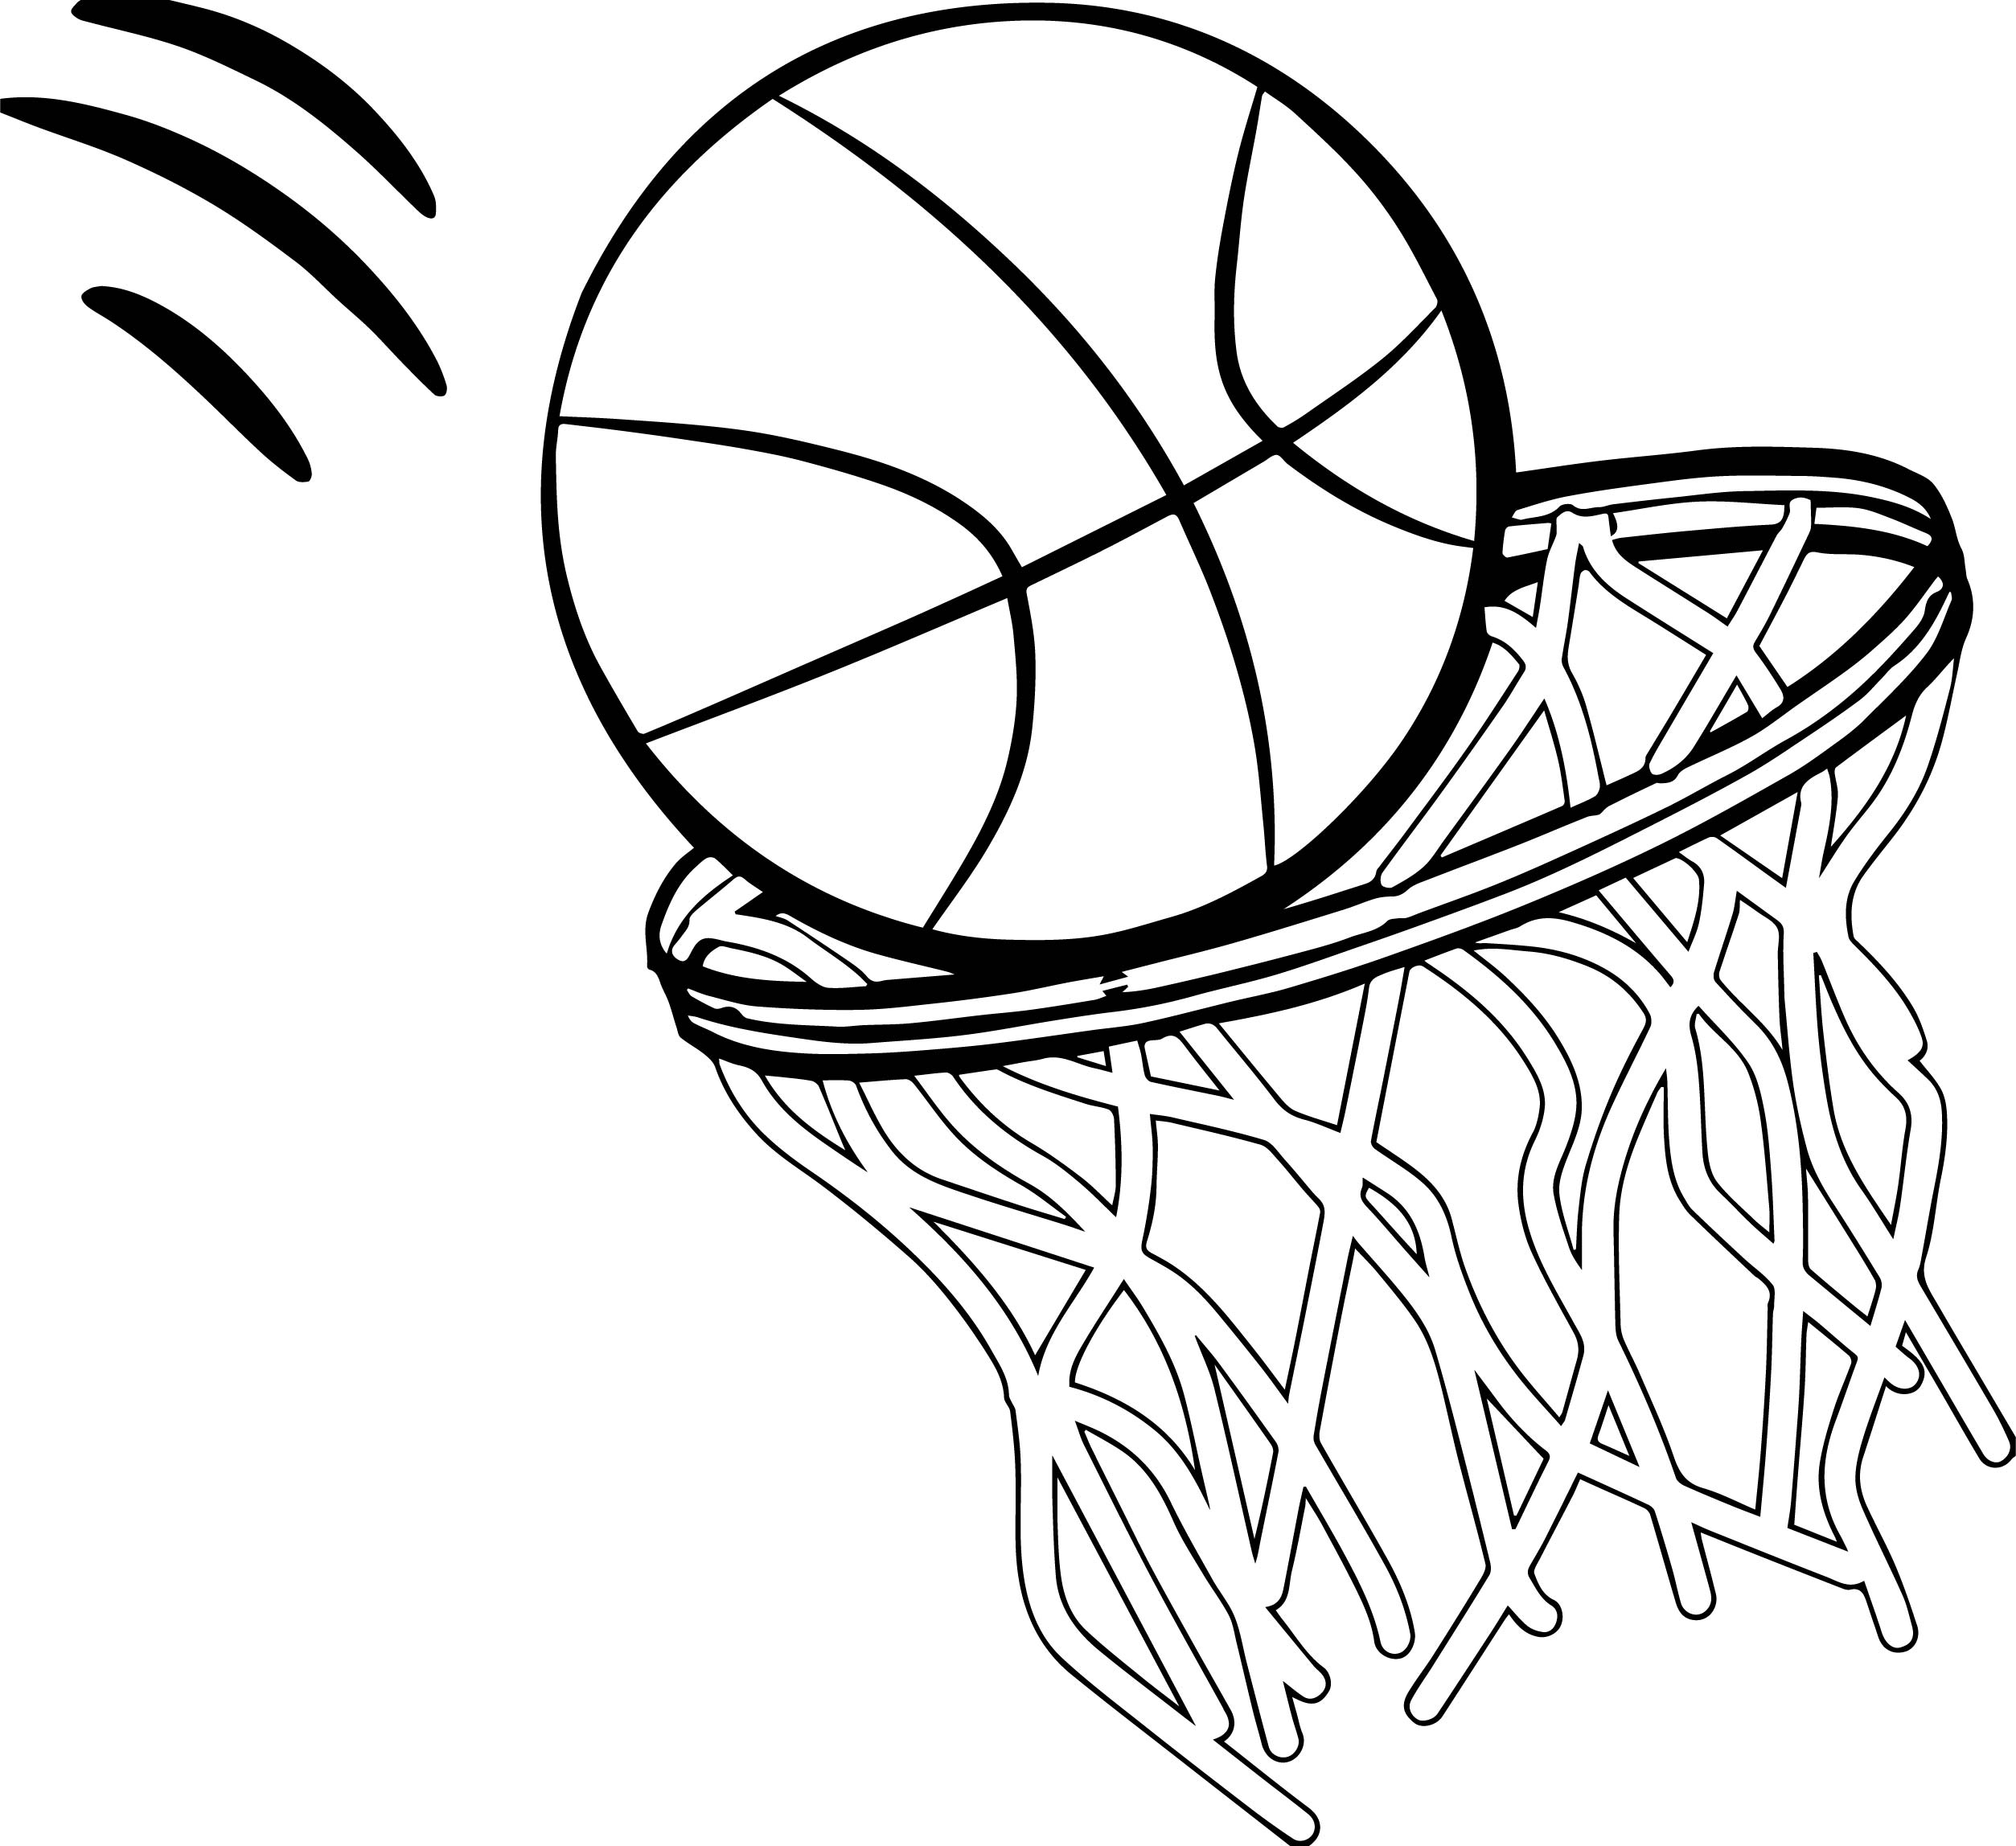 Basketball Rim Drawing at GetDrawings.com | Free for ...